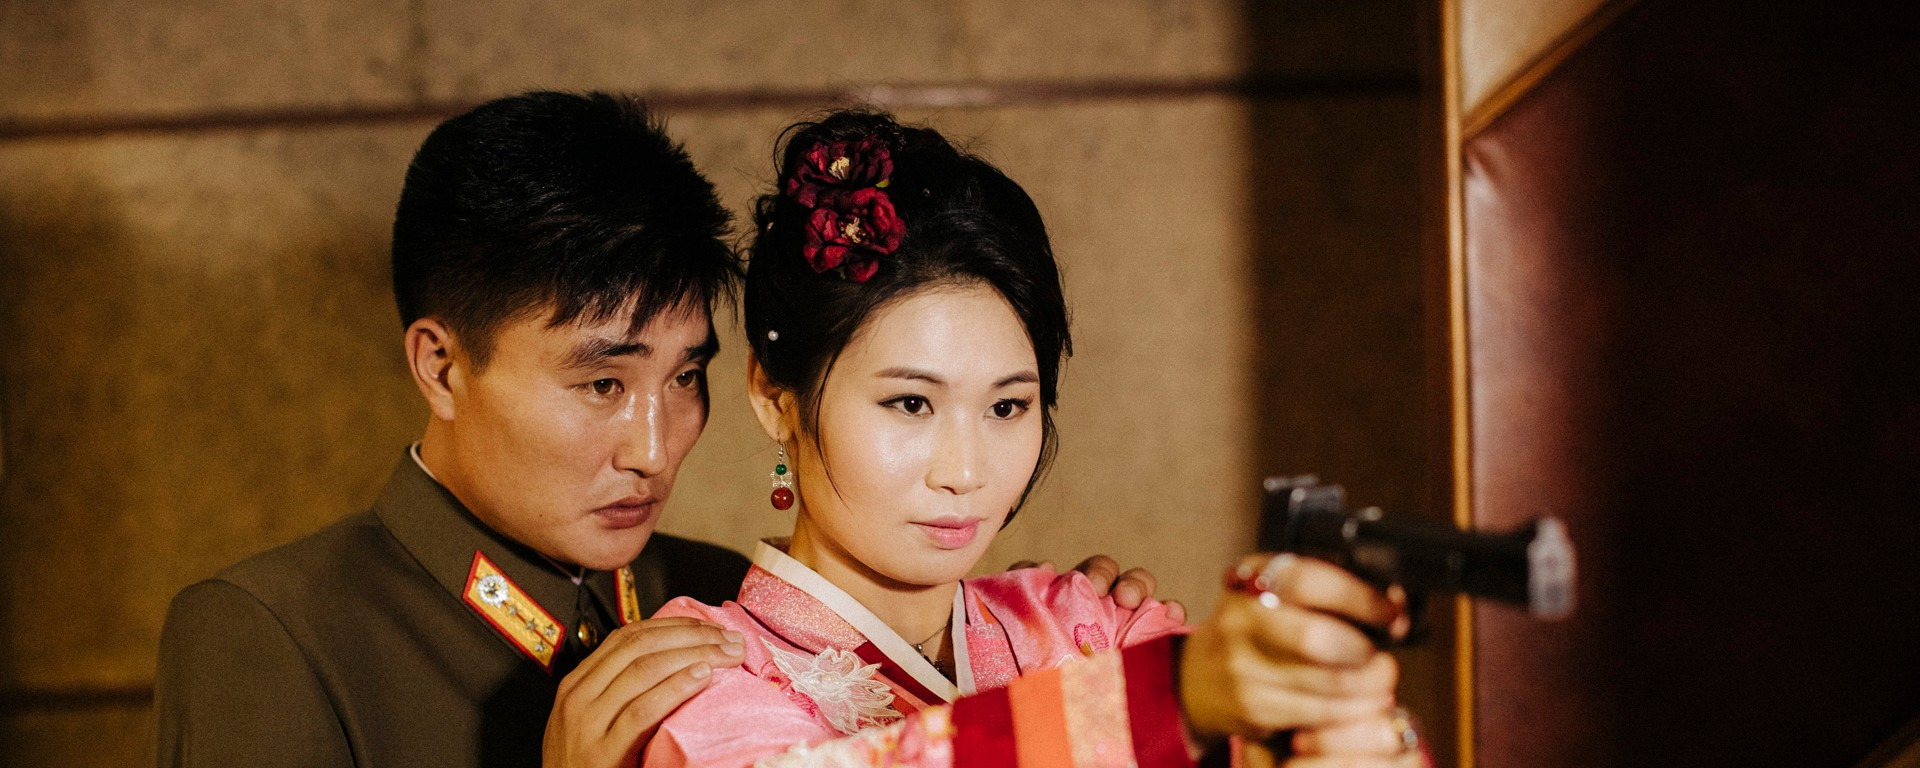 coreenii fac bani din videoclipuri cu alimente